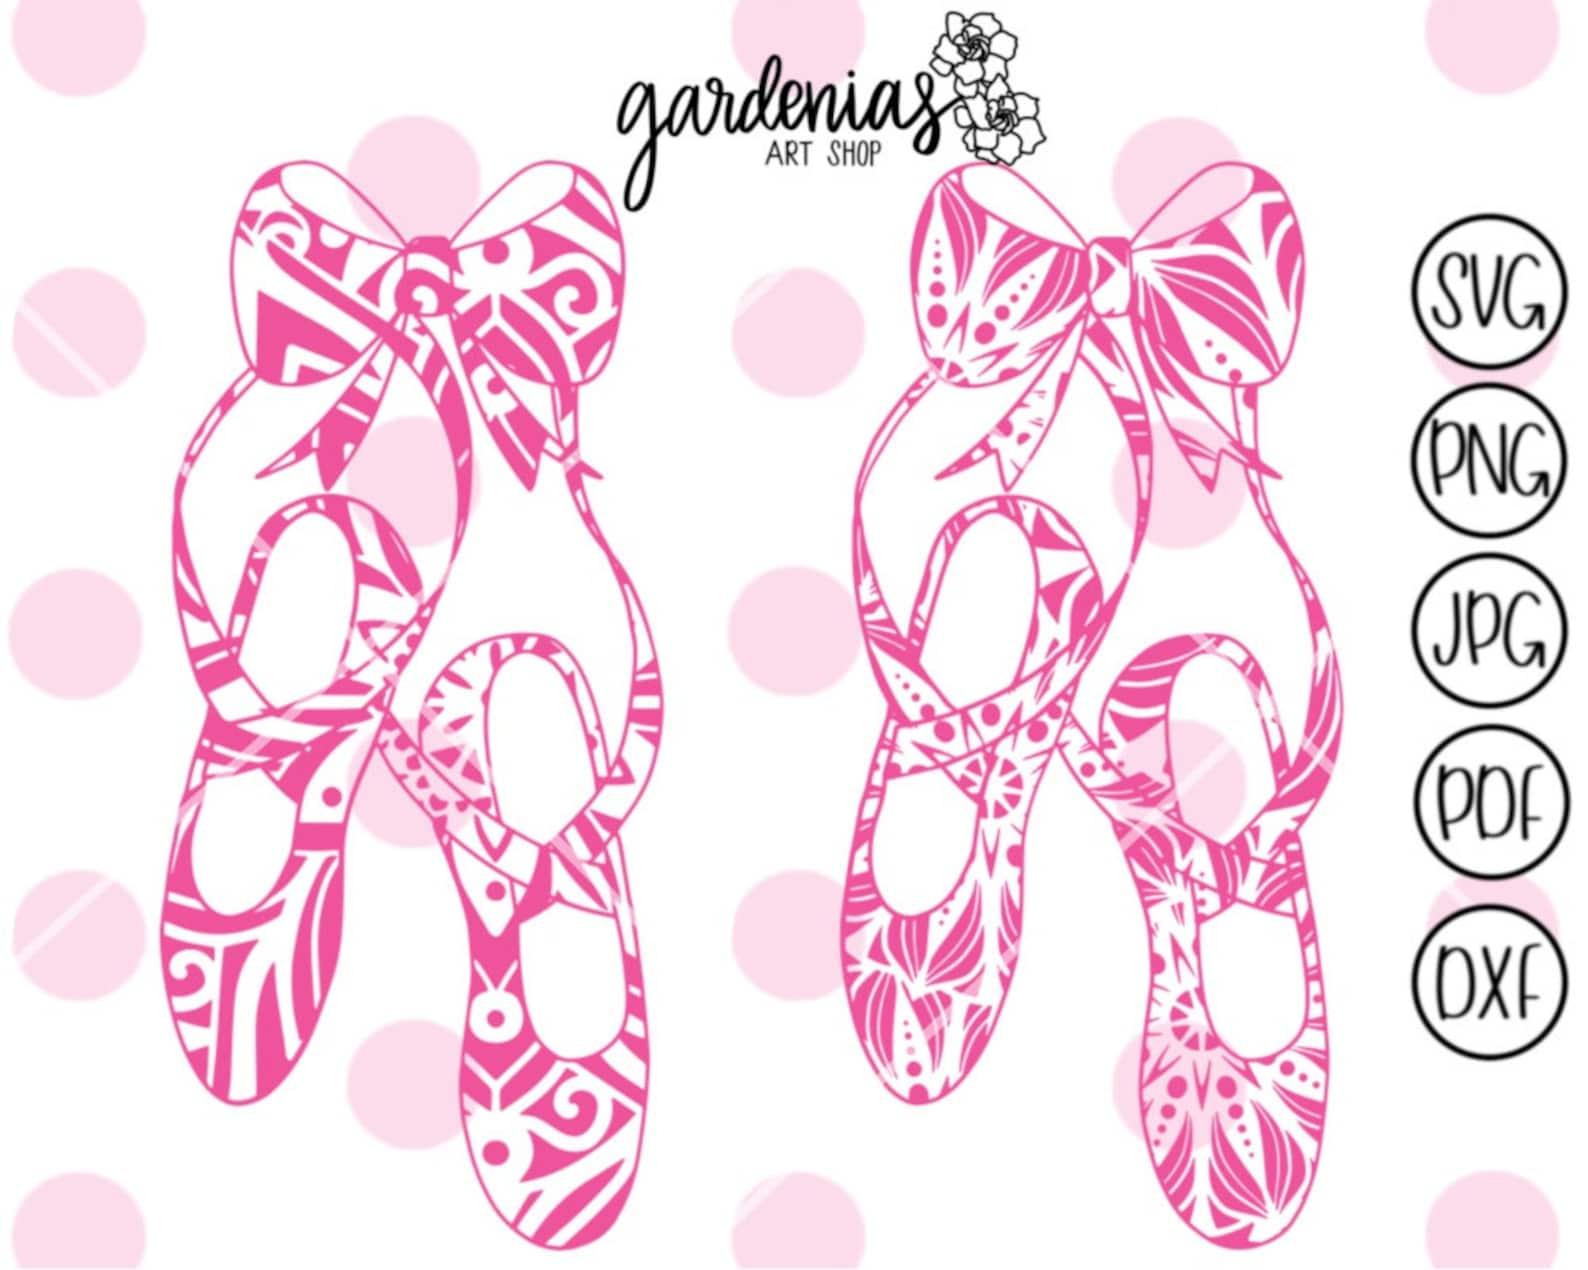 ballet mandala svg, ballerina mandala svg, ballet slippers svg, ballet shoes svg, ballet slippers mandala svg, dance life svg, d